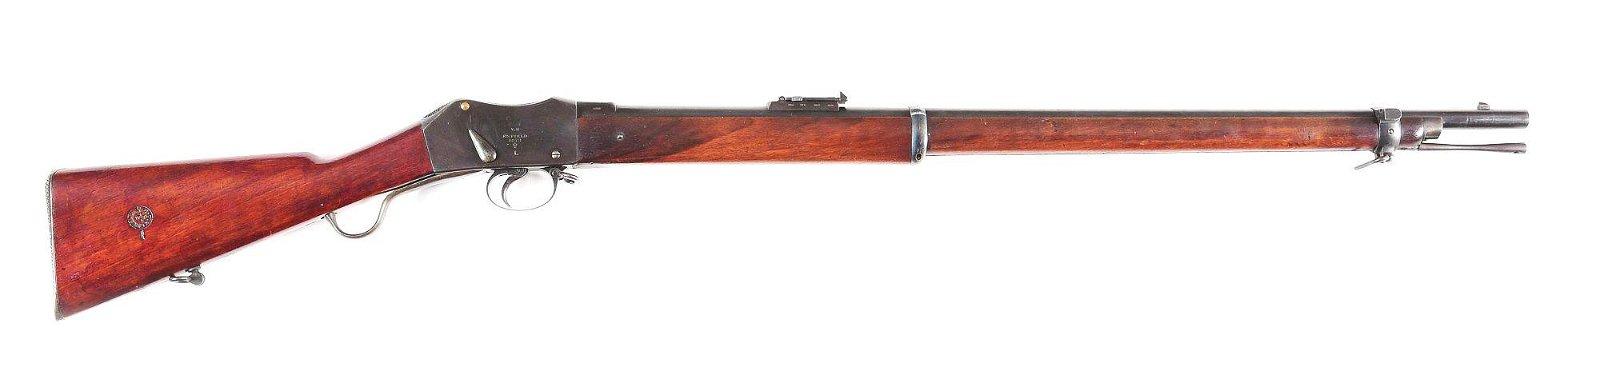 (A) ENFIELD MARTINI .577/450 SINGLE SHOT RIFLE.